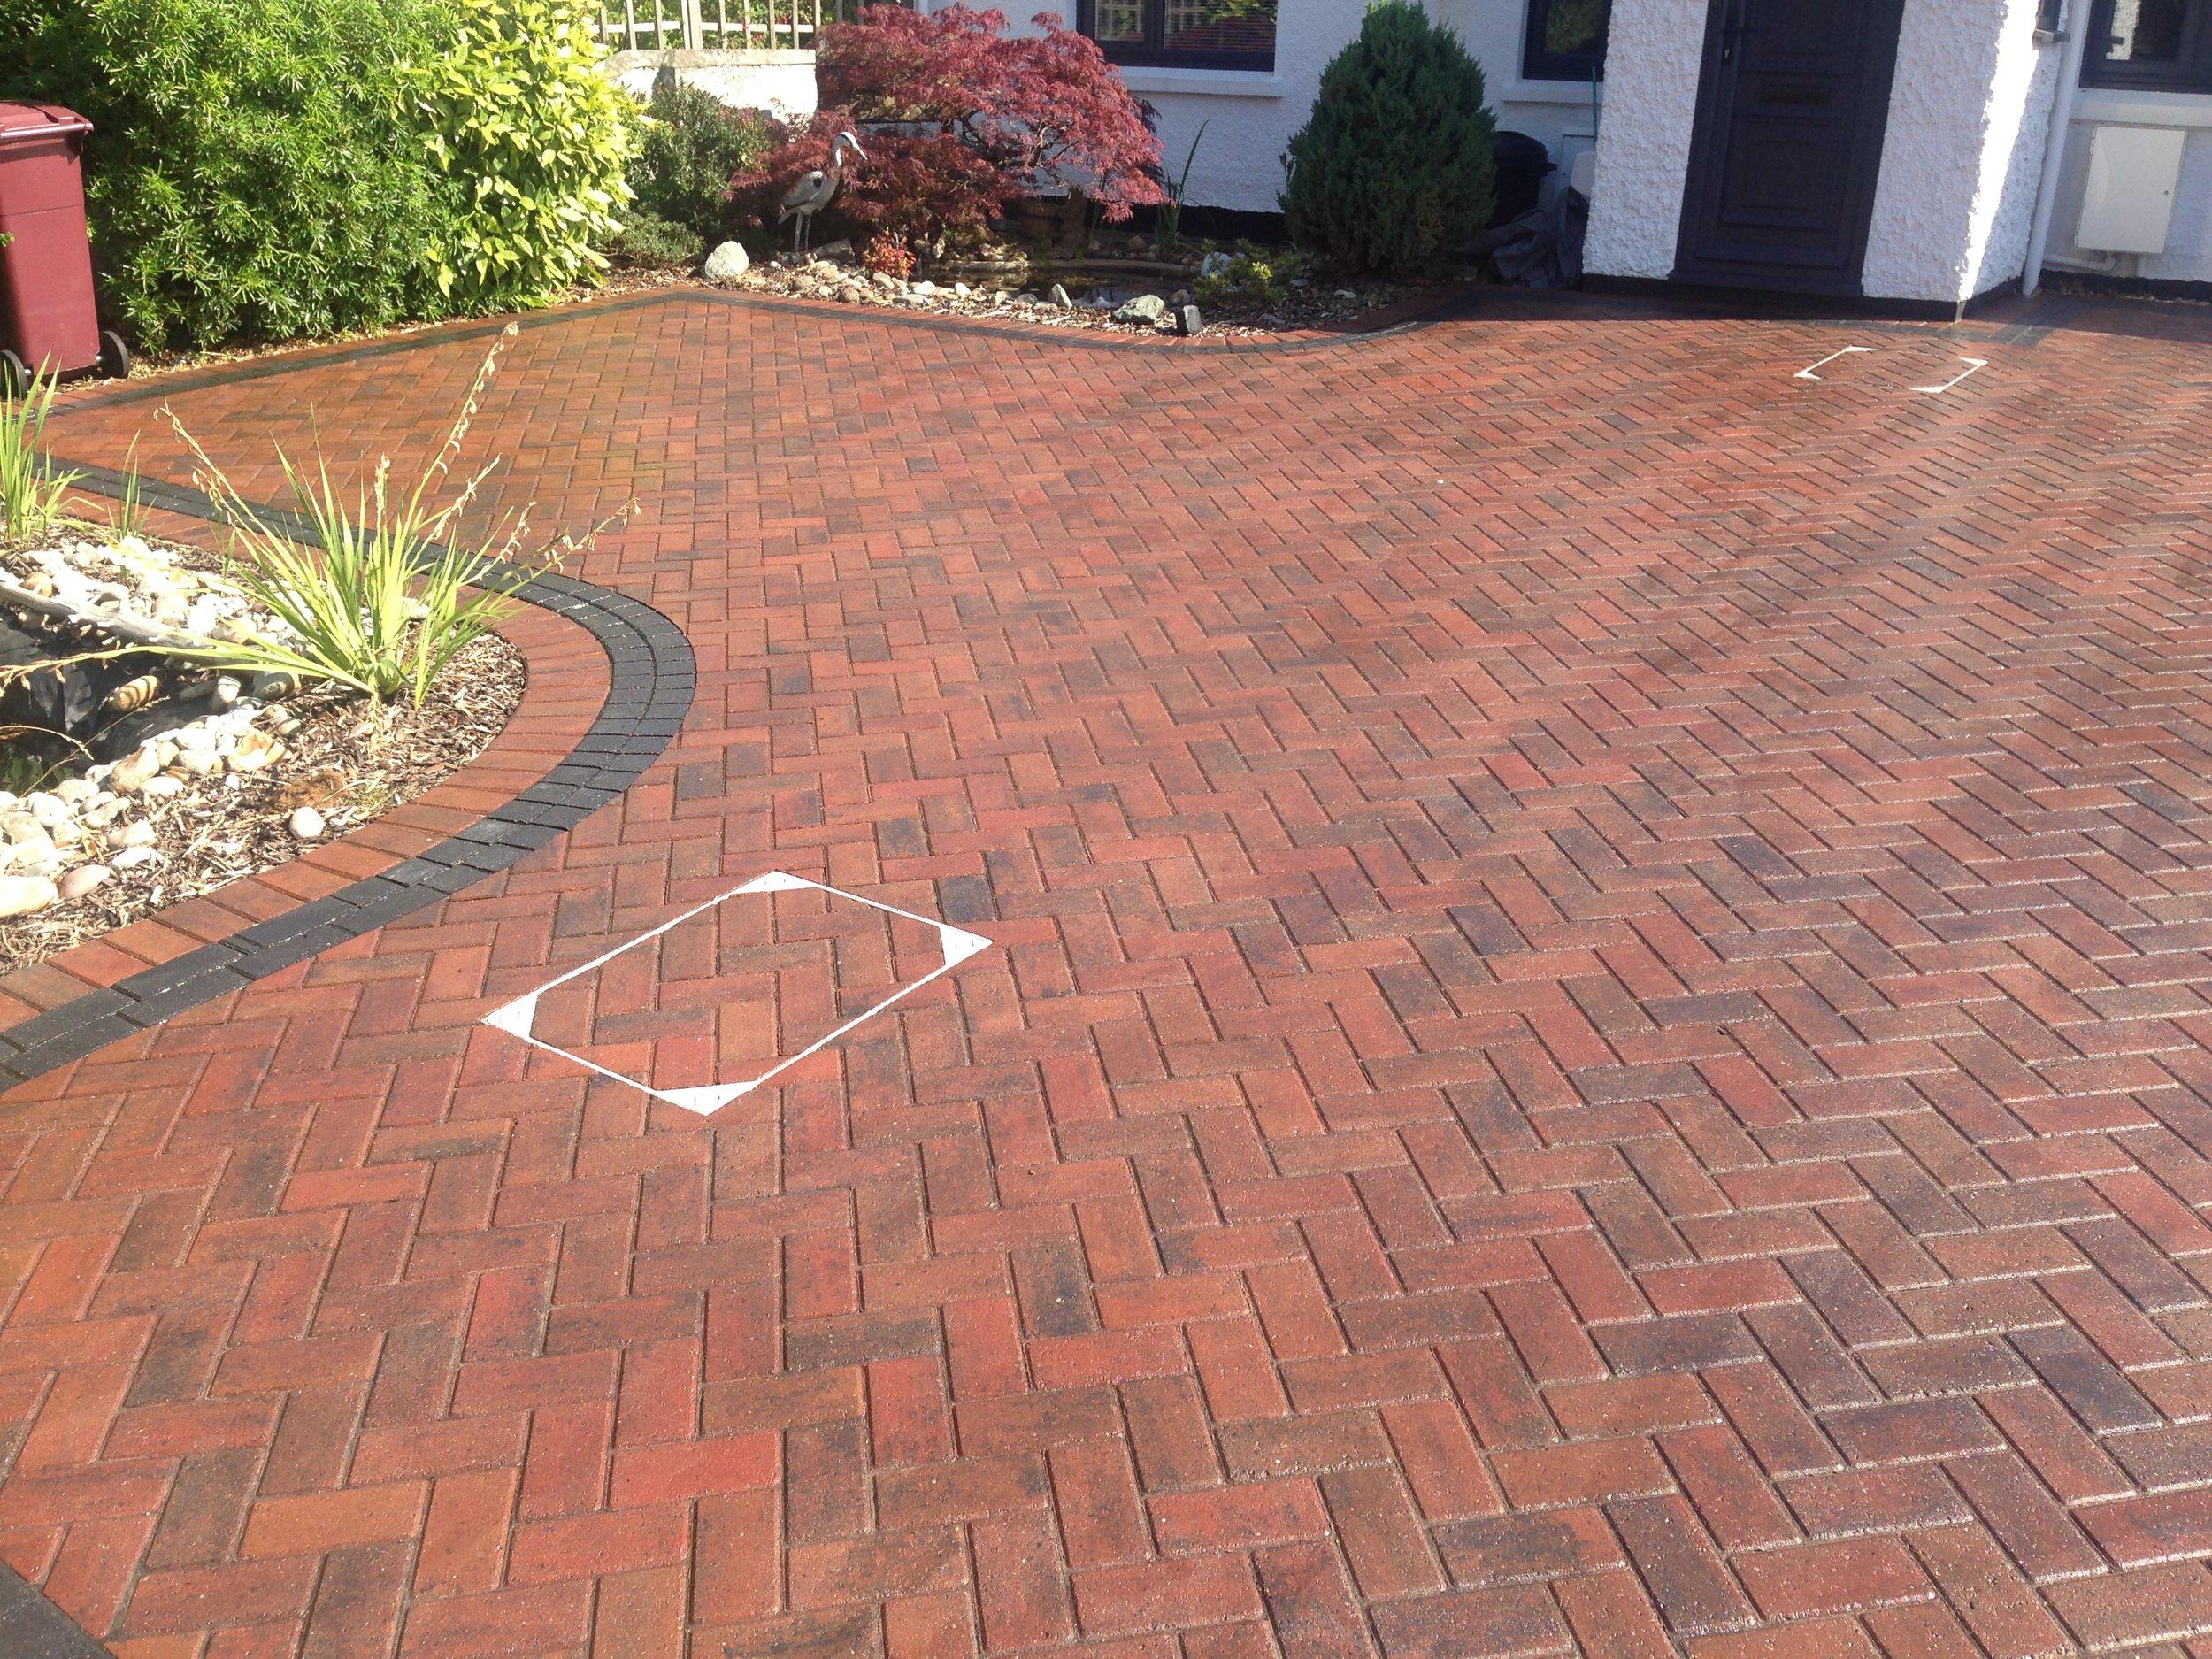 Brett Omega Paving used on this driveway